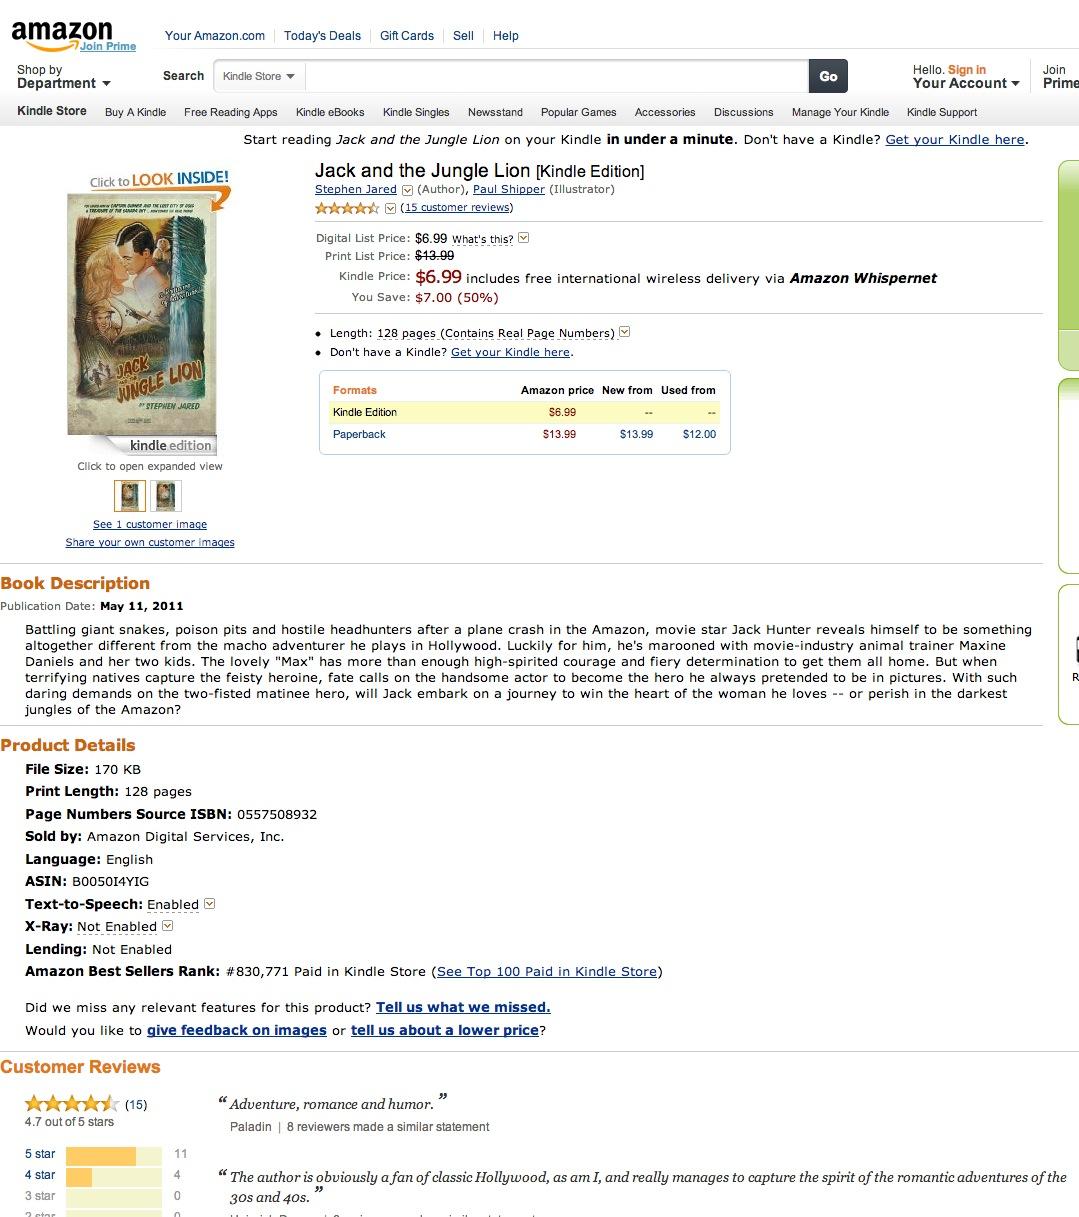 Jack and the Jungle Lion - Amazon.com